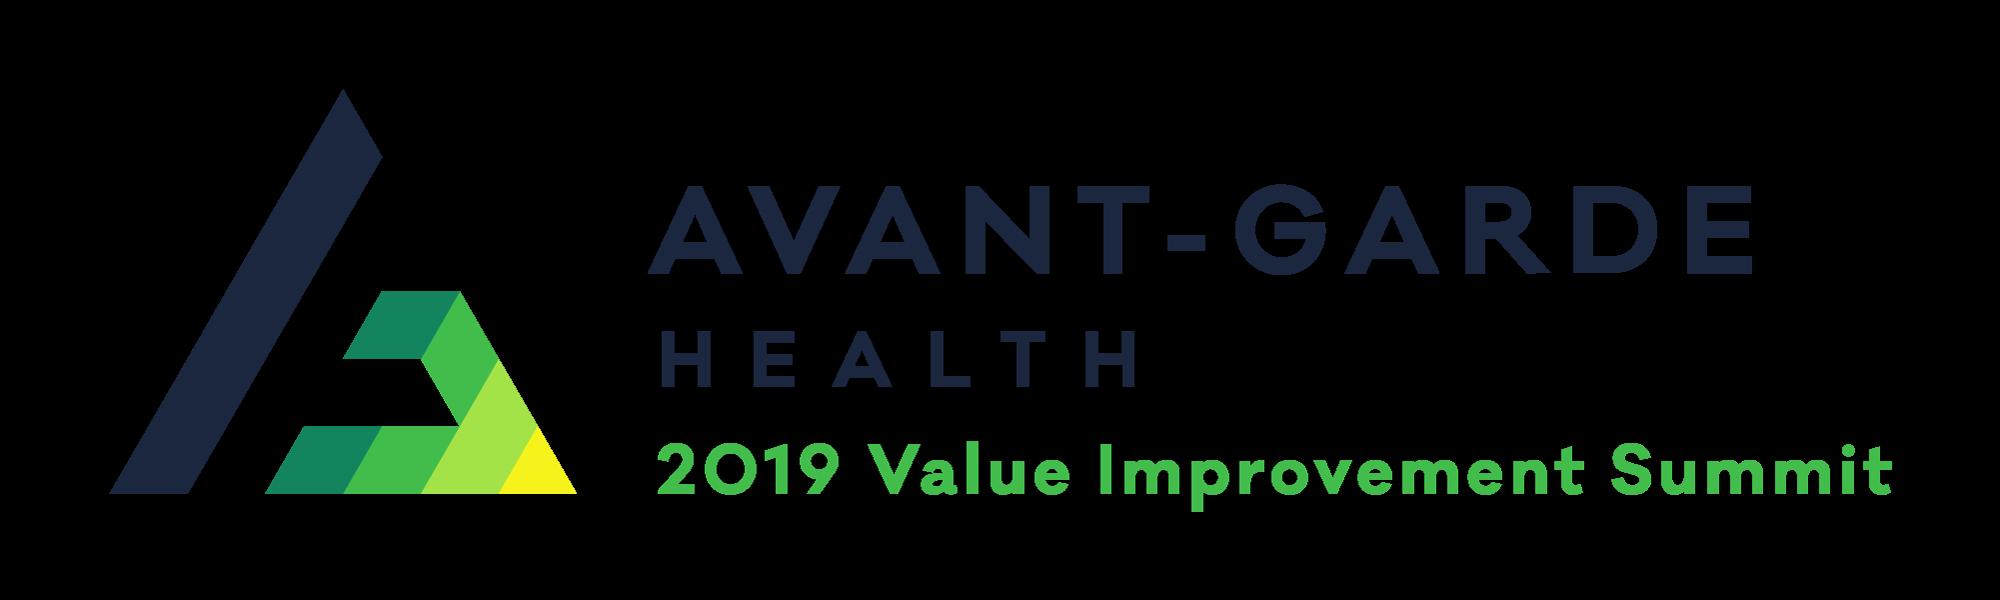 avant-garde-health-value-improvement-summit-2019-logo.png